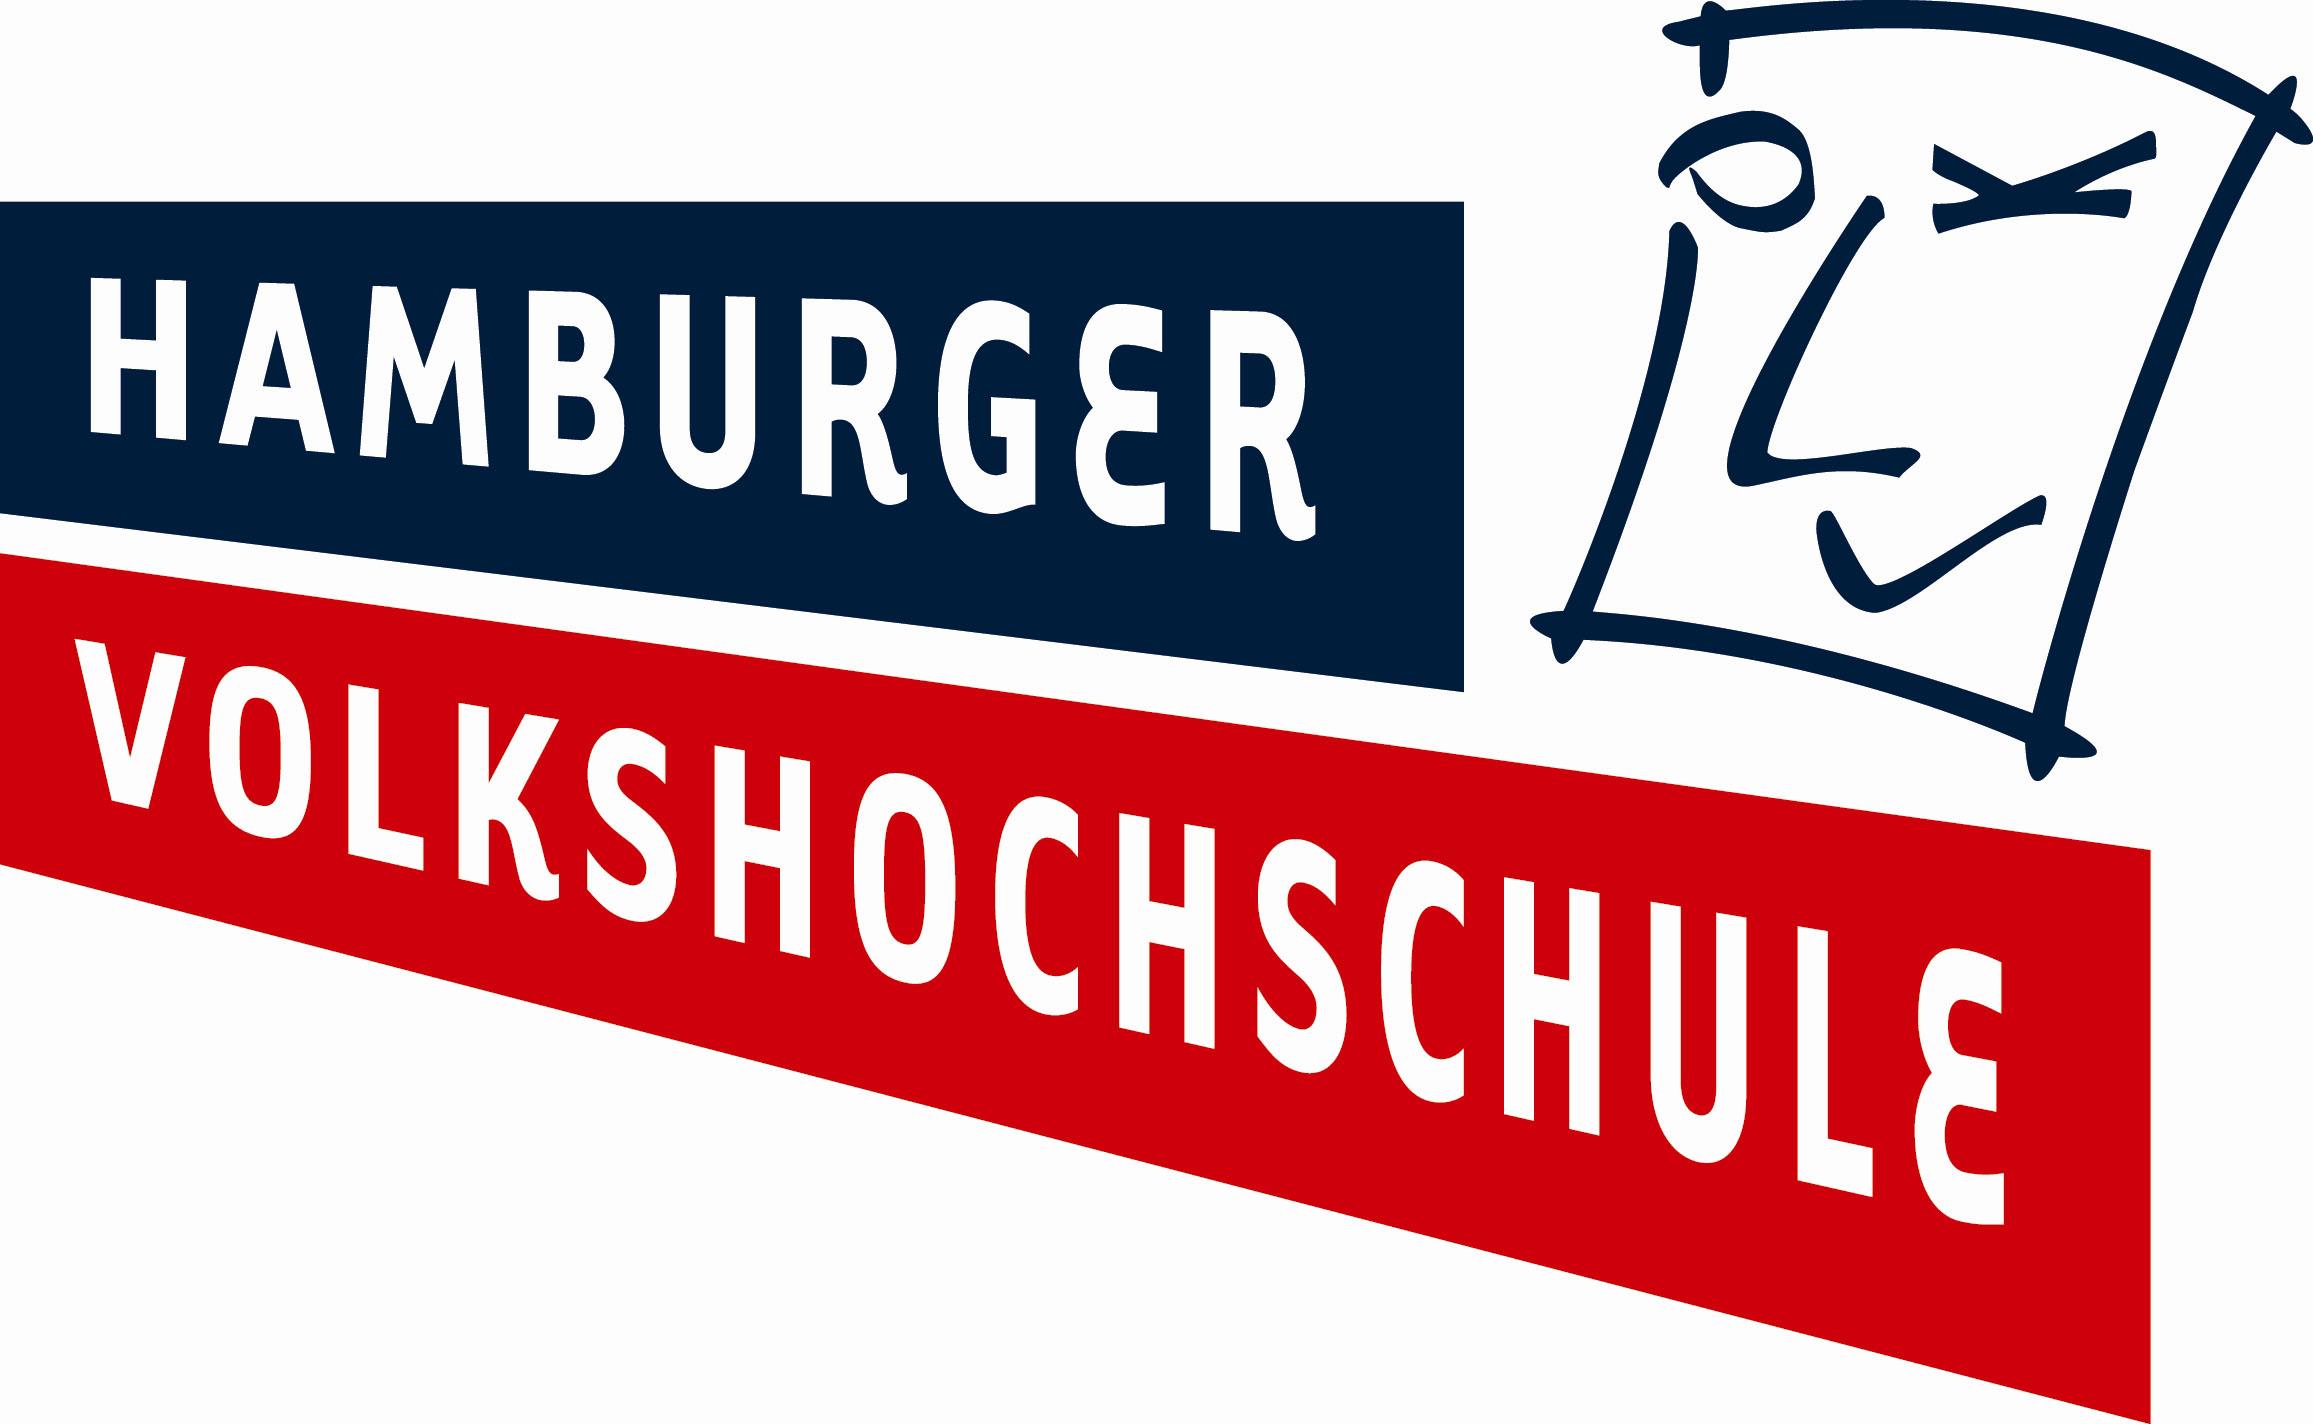 Community College Hamburg